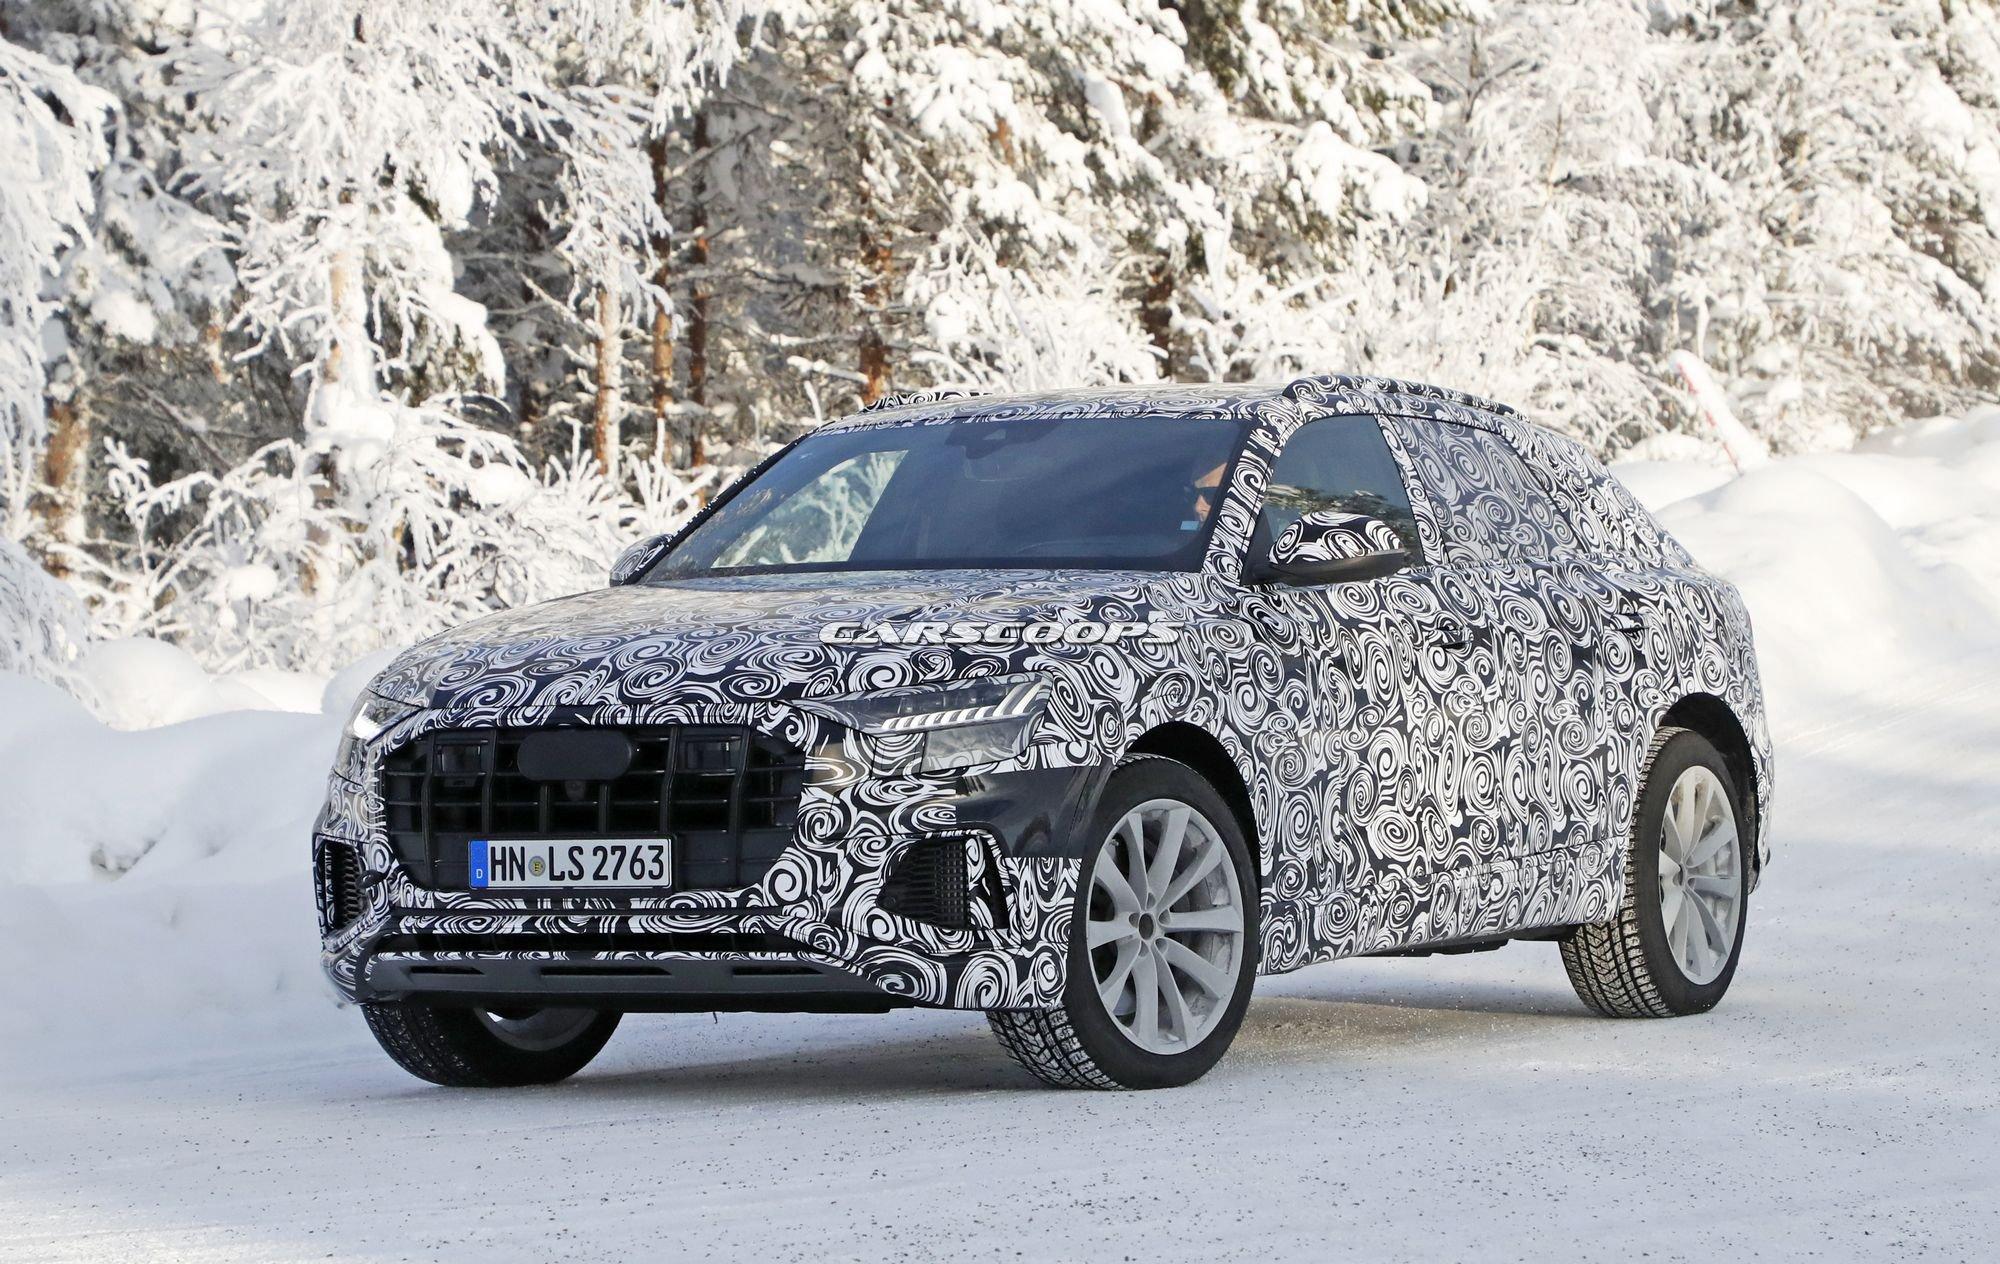 Audi-SQ8-Spy-Shots-3.jpg